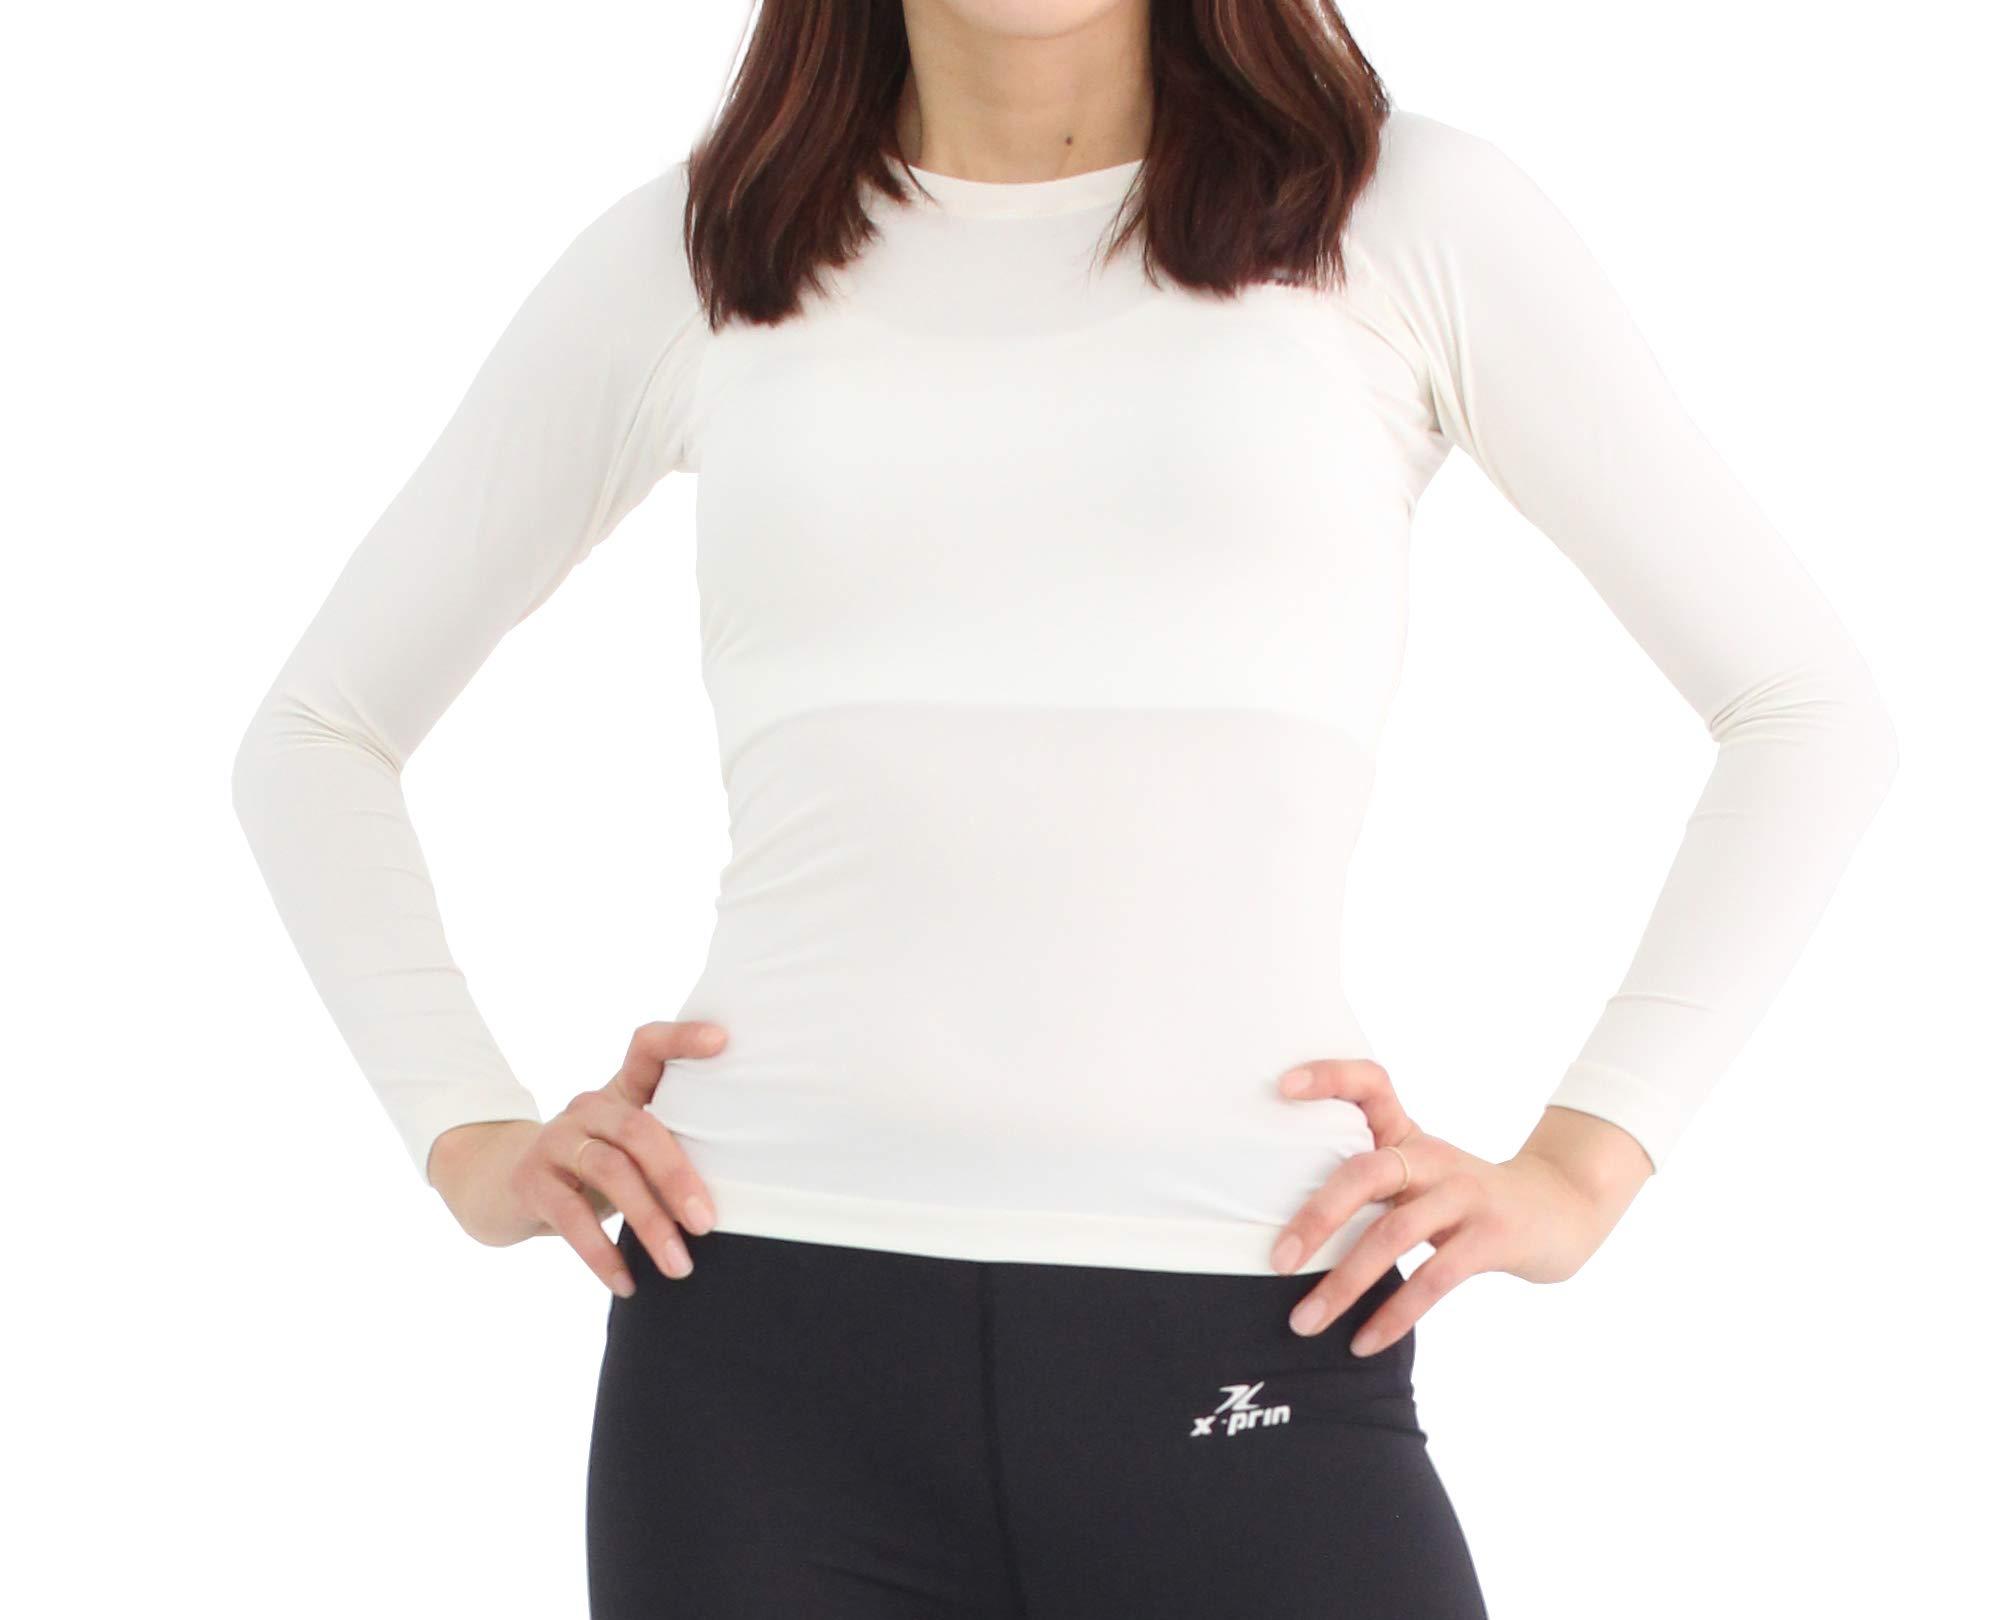 XPRIN A100 Series Women's Long Sleeve Cool Base Layer Compression Shirt Sports Wear (3XL, A102 White) by X-PRIN